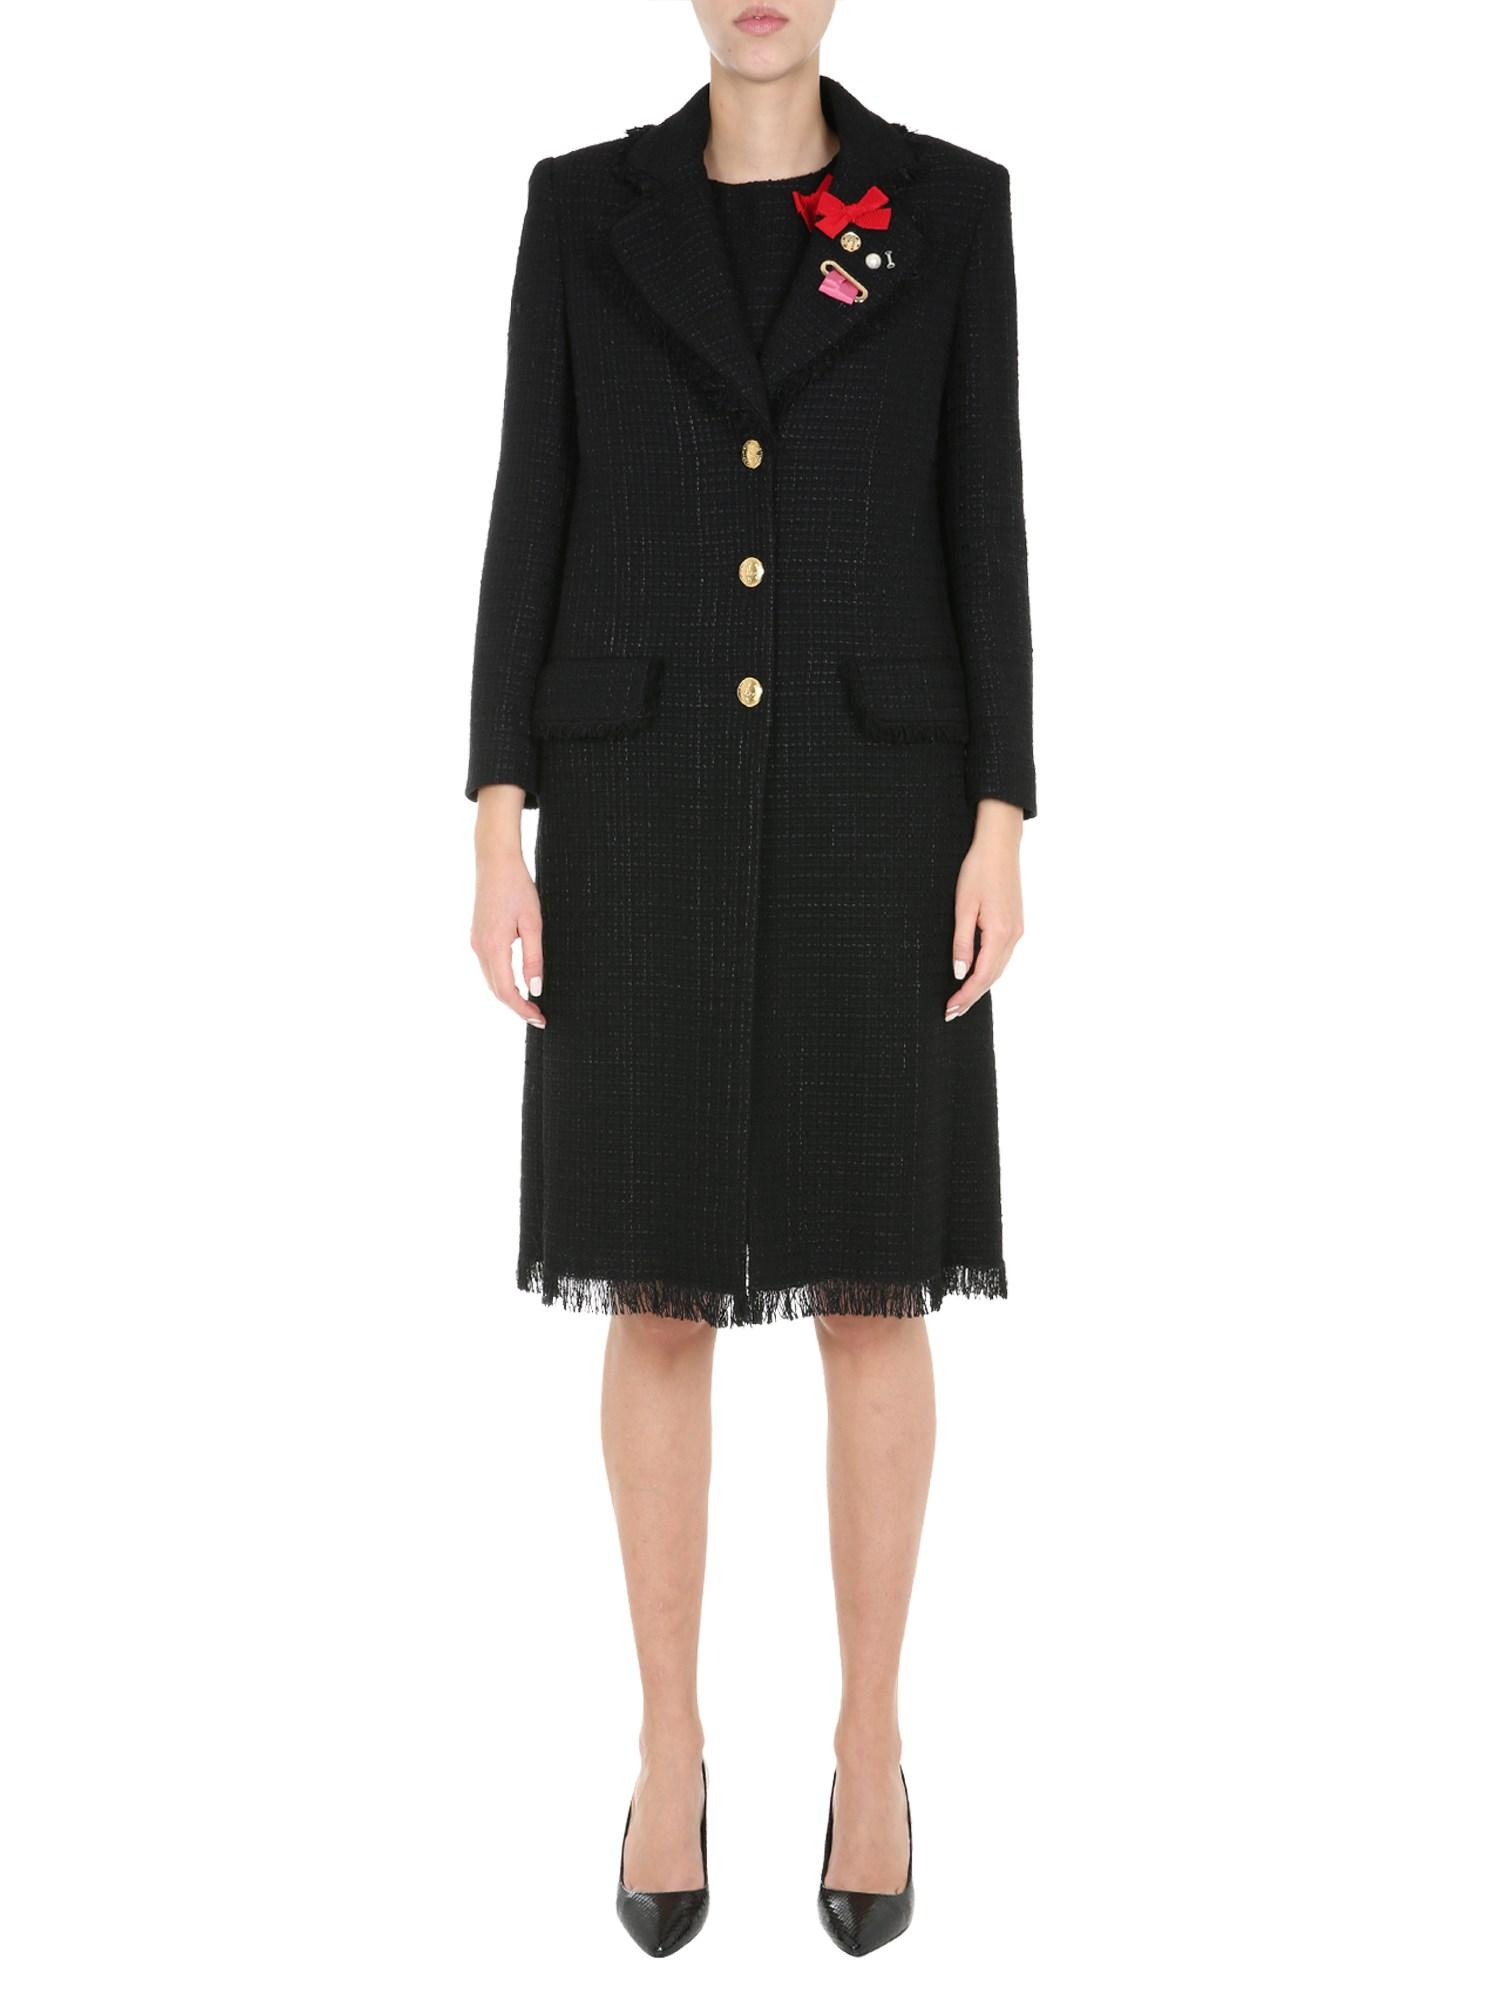 Boutique moschino mat coat - boutique moschino - Modalova